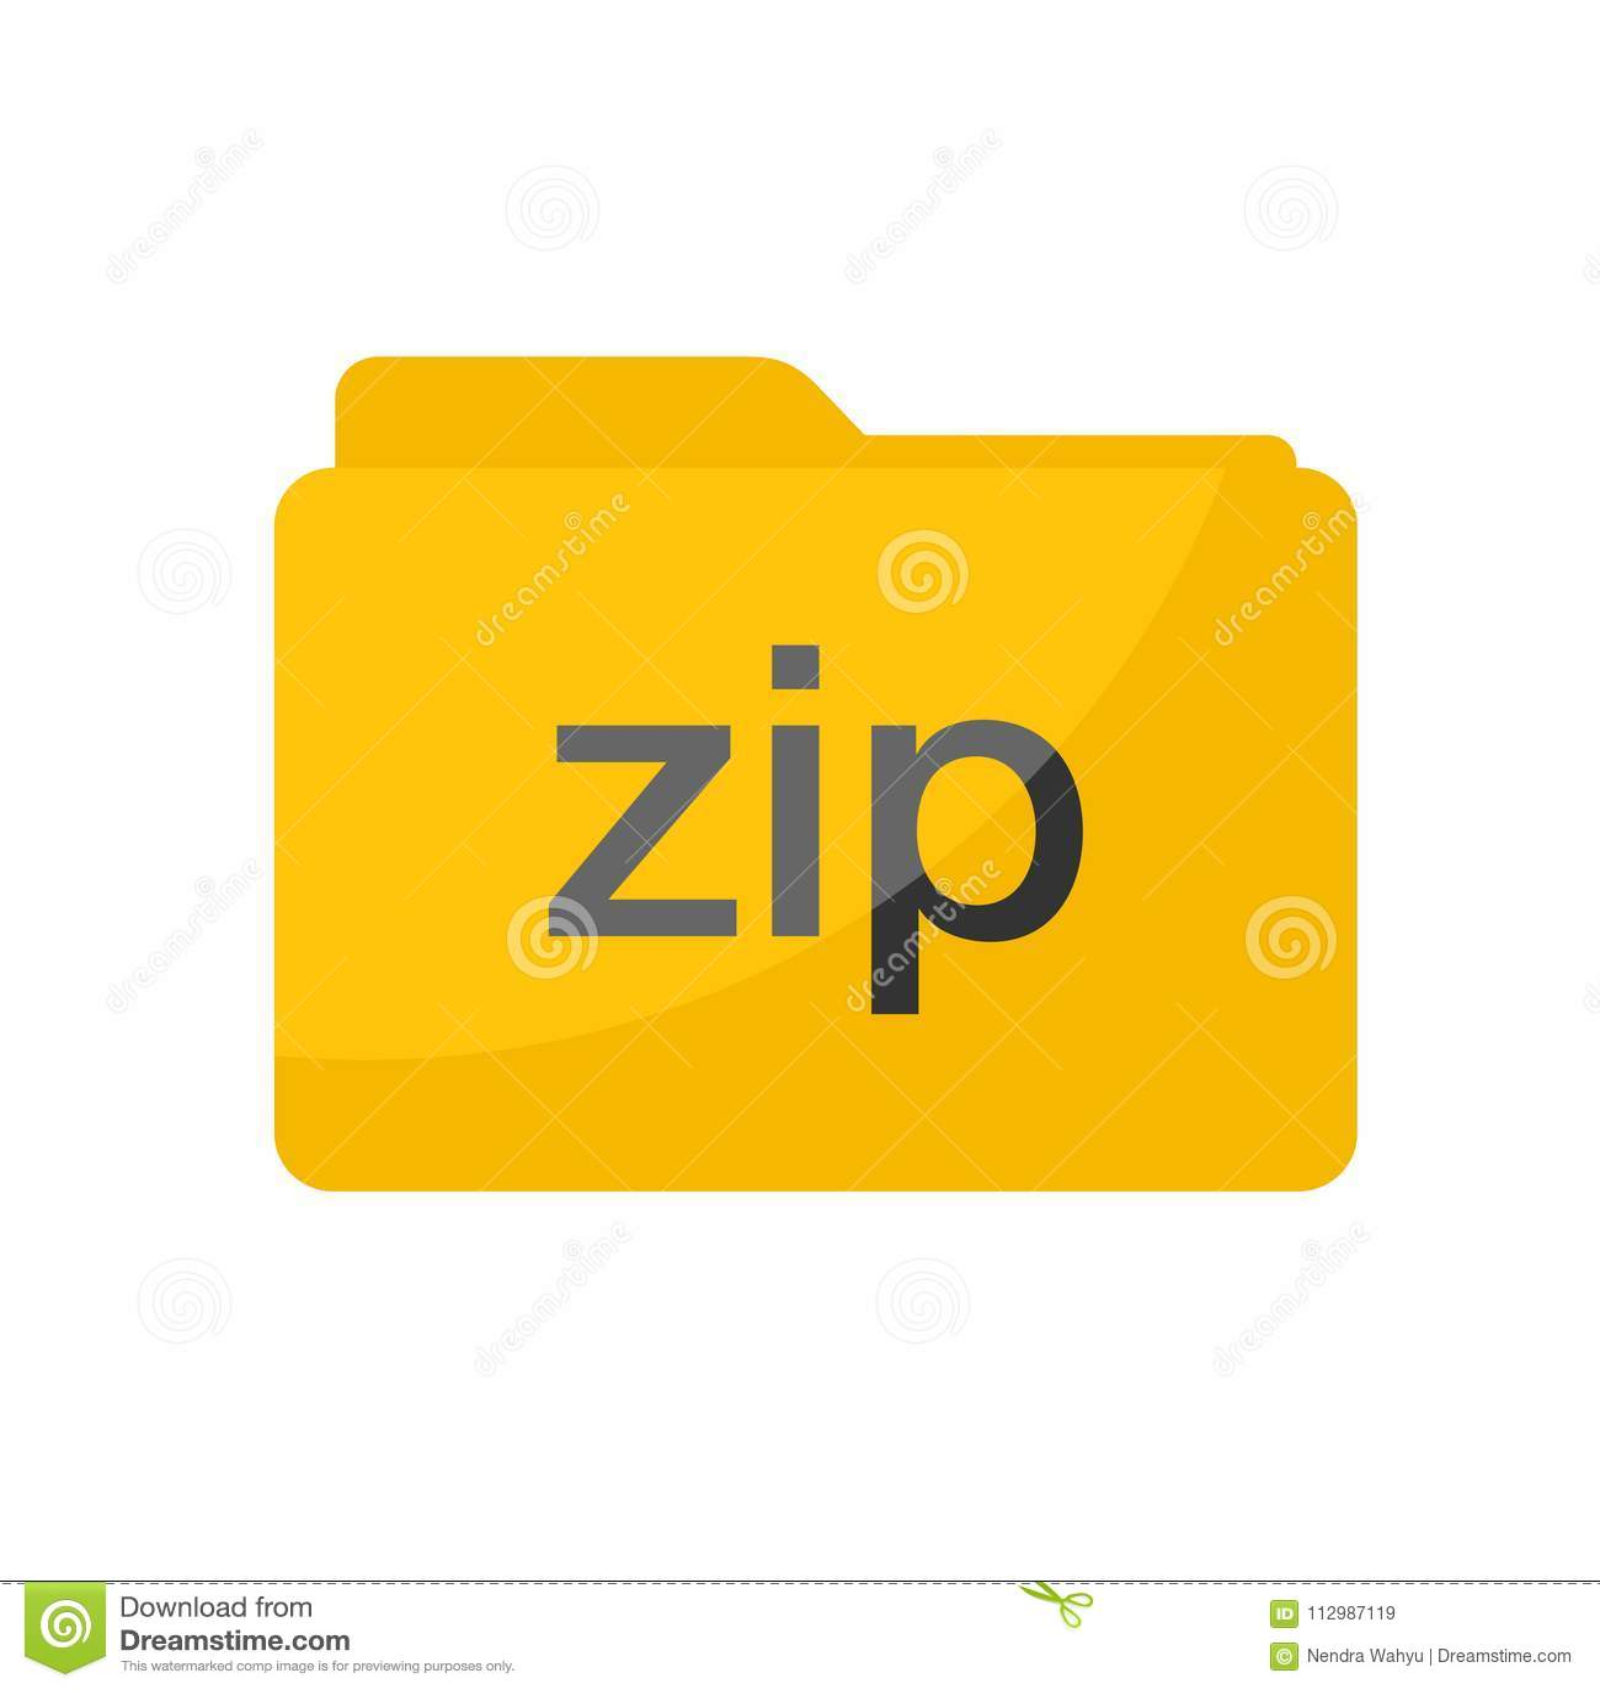 Simple Flat minimalist yellow zip compressed file folder icon